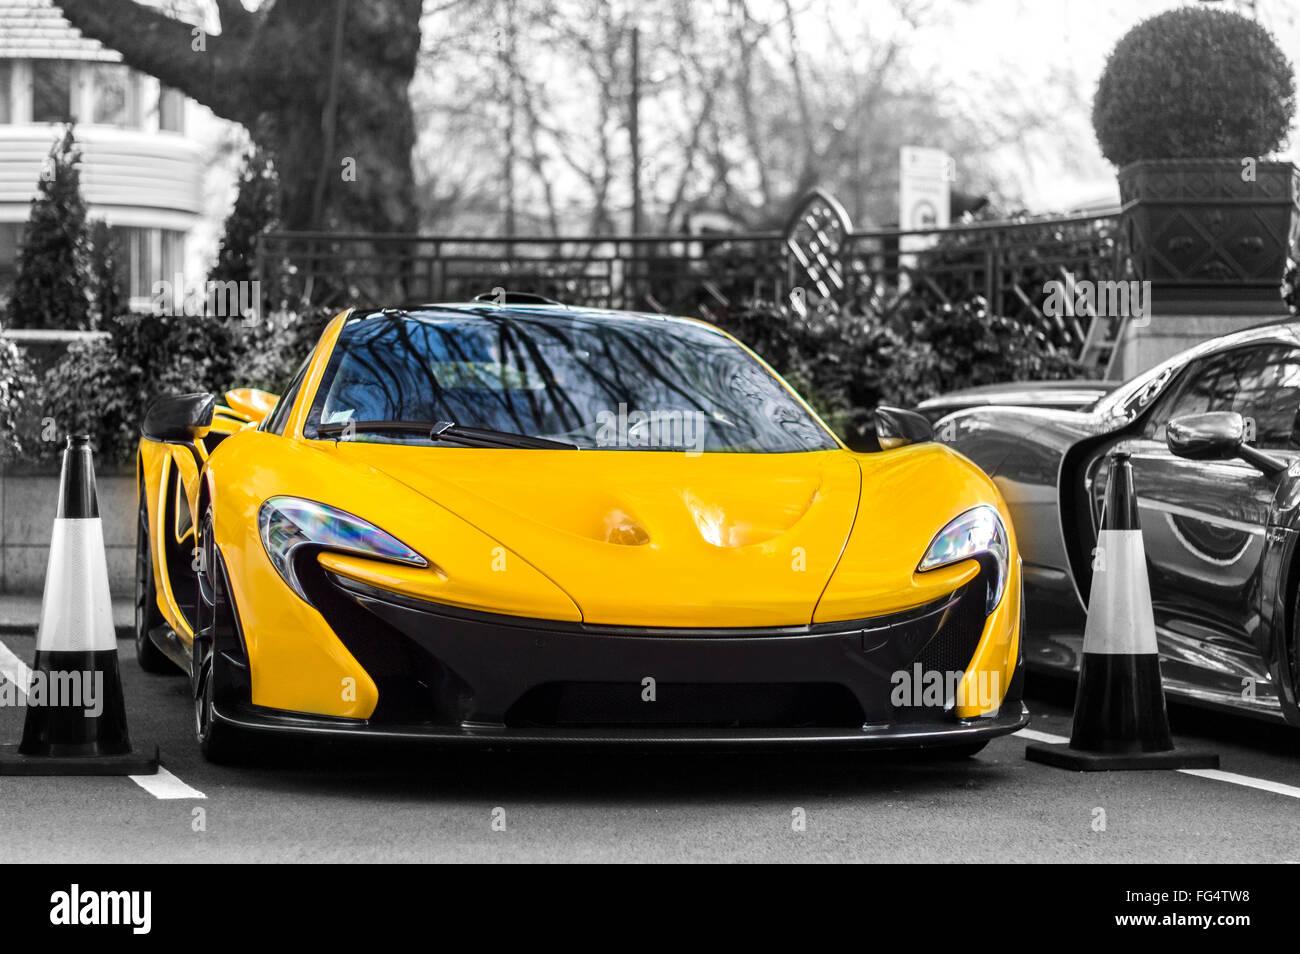 McLaren P1 nella città Immagini Stock